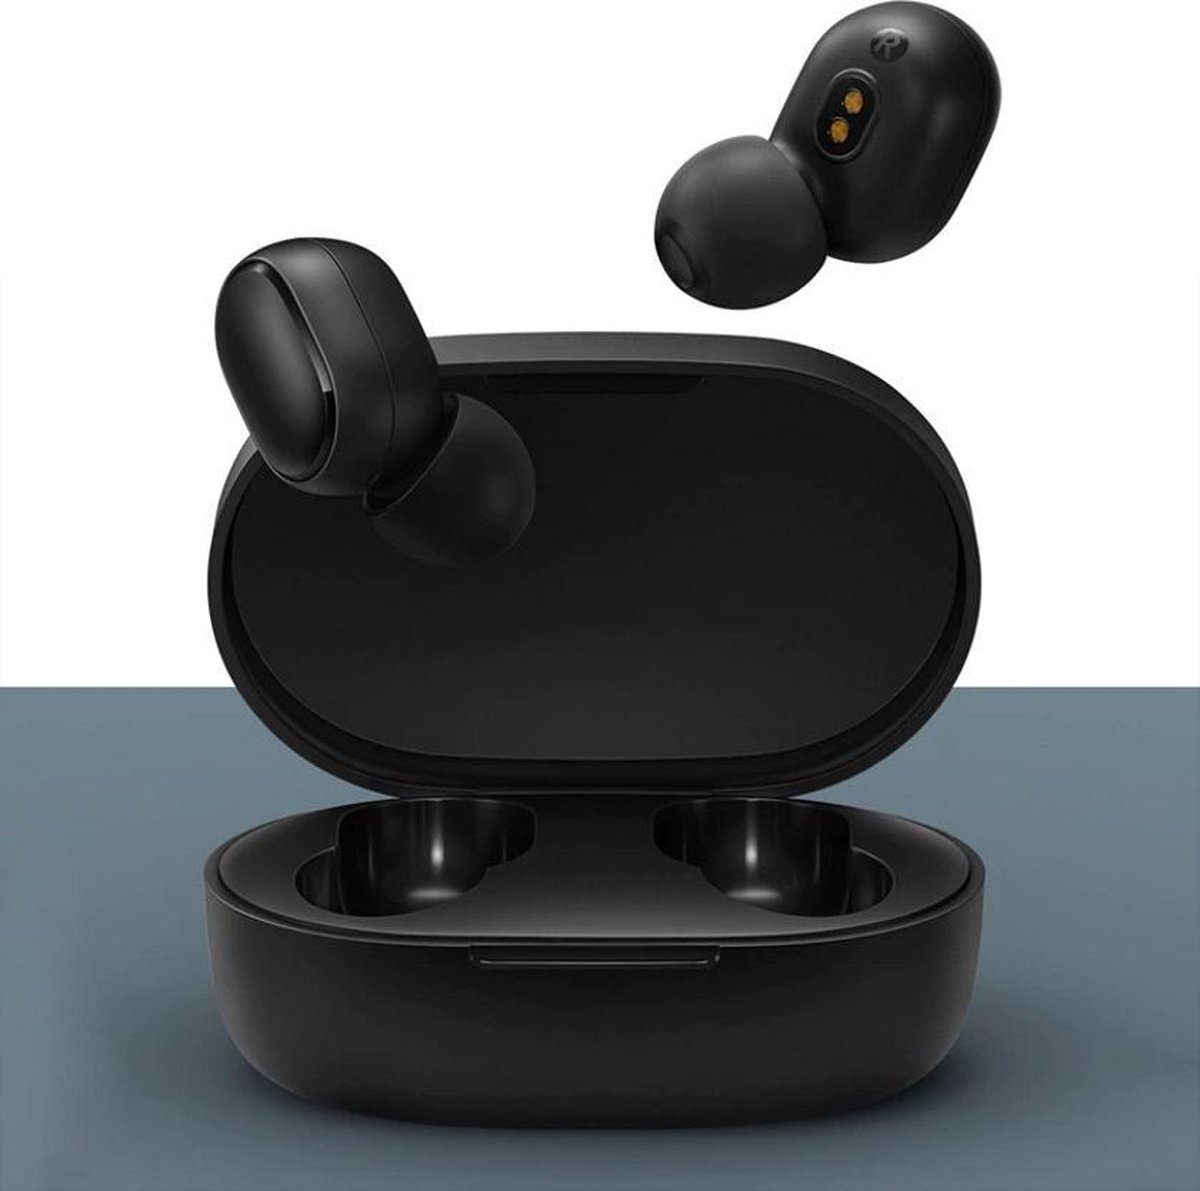 Xiaomi Redmi Airdots – Draadloze oordopjes – Zwart – Wireless Earbuds